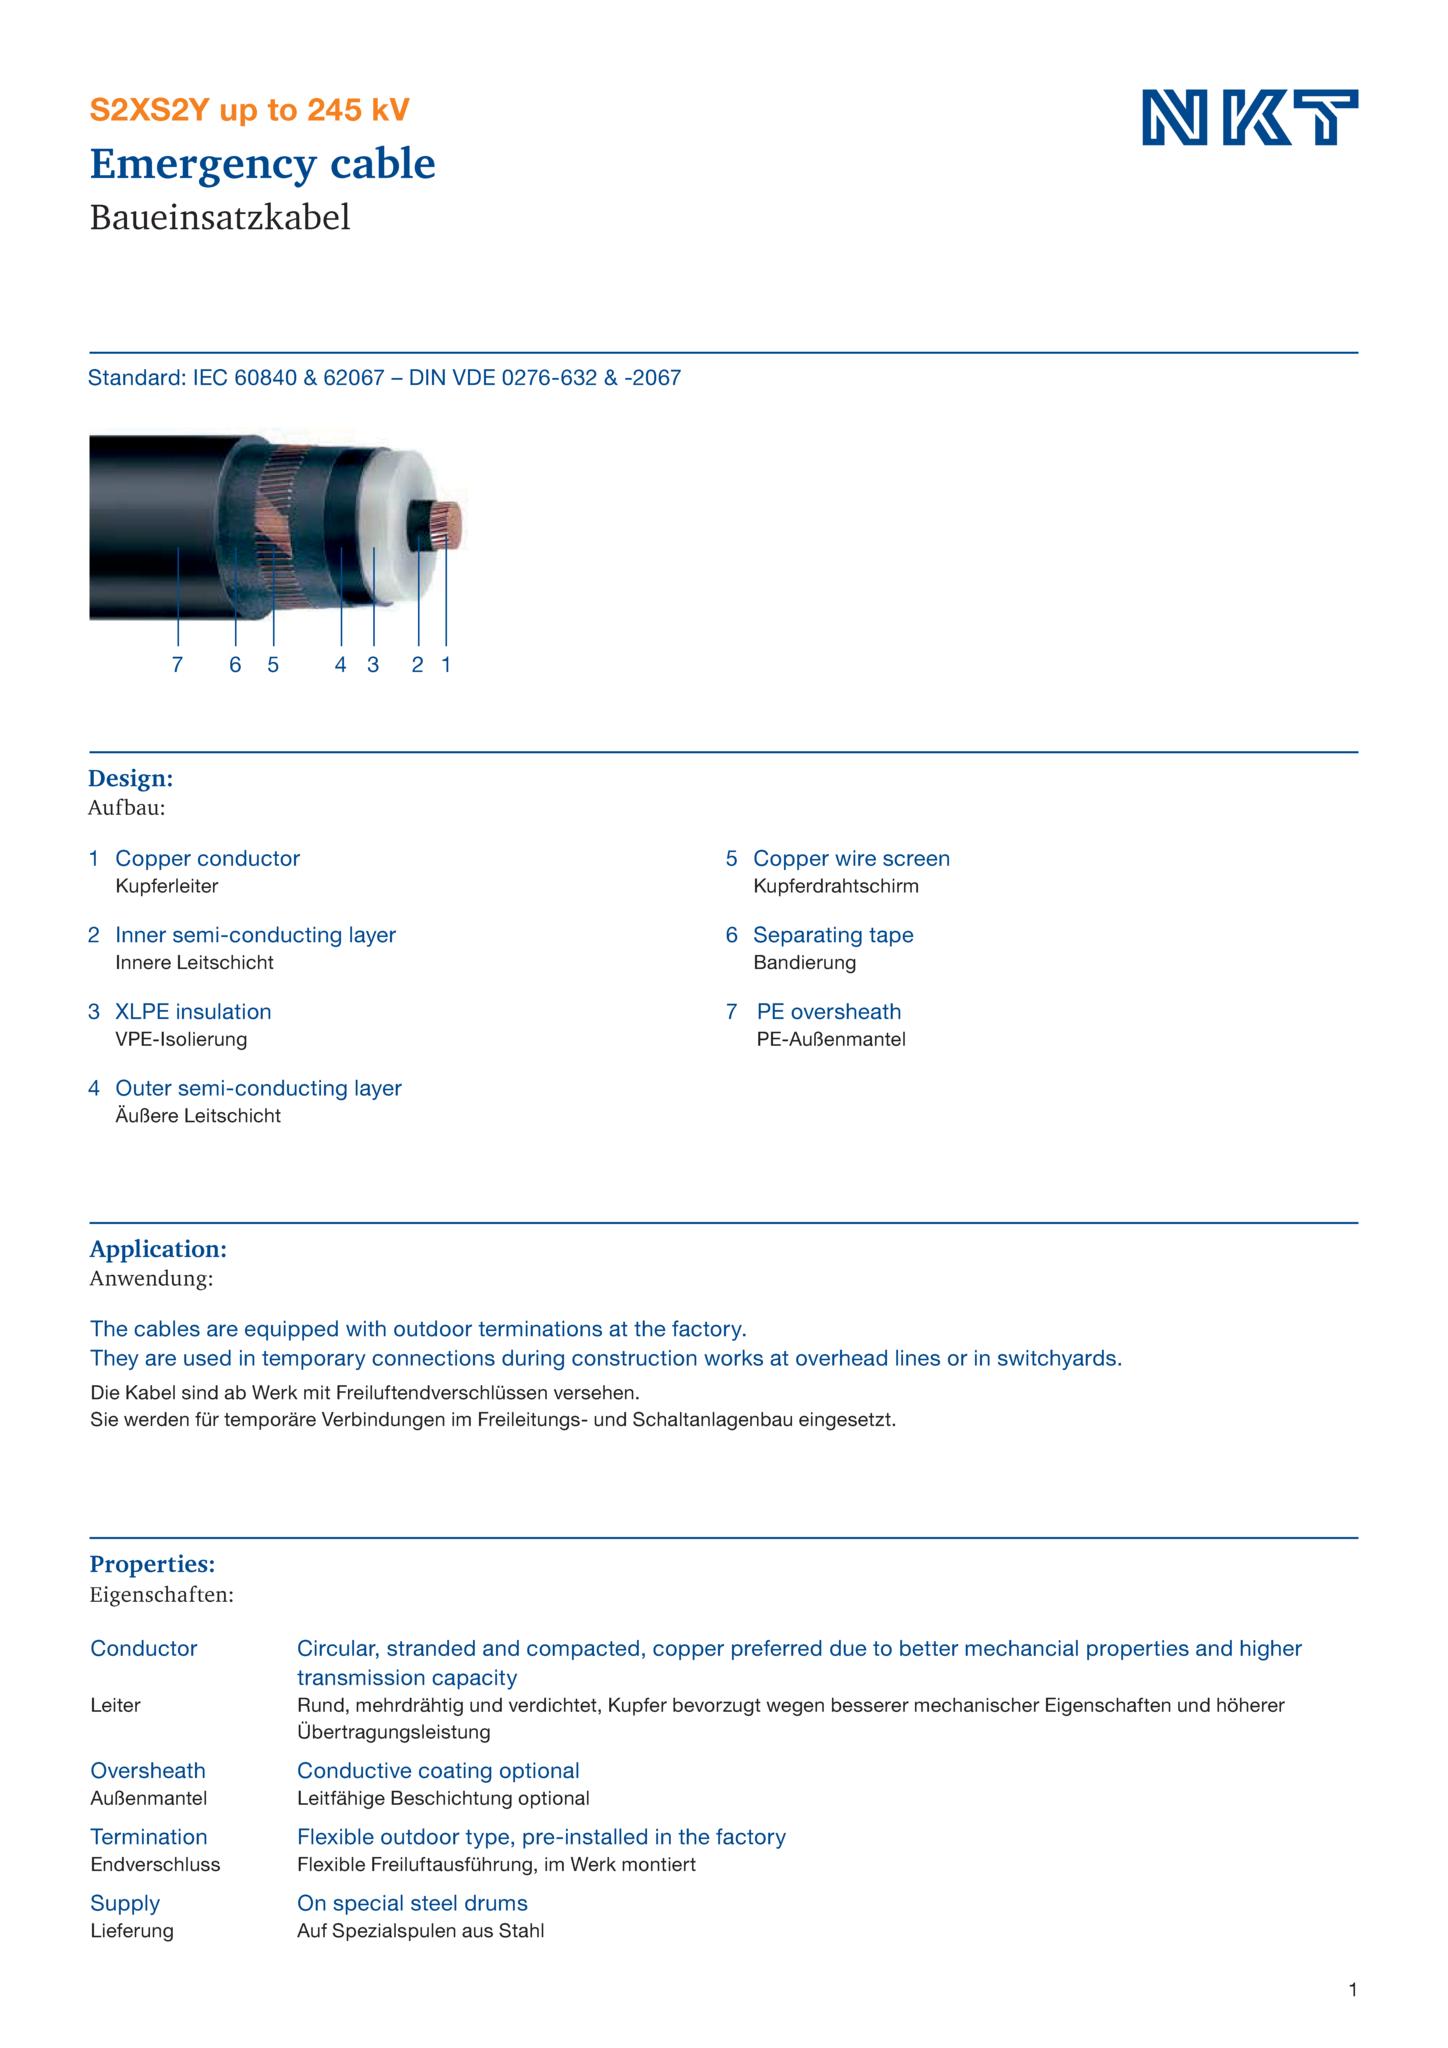 _S2XS2Y_up_to_245_kV_DS_DE_EN.pdf